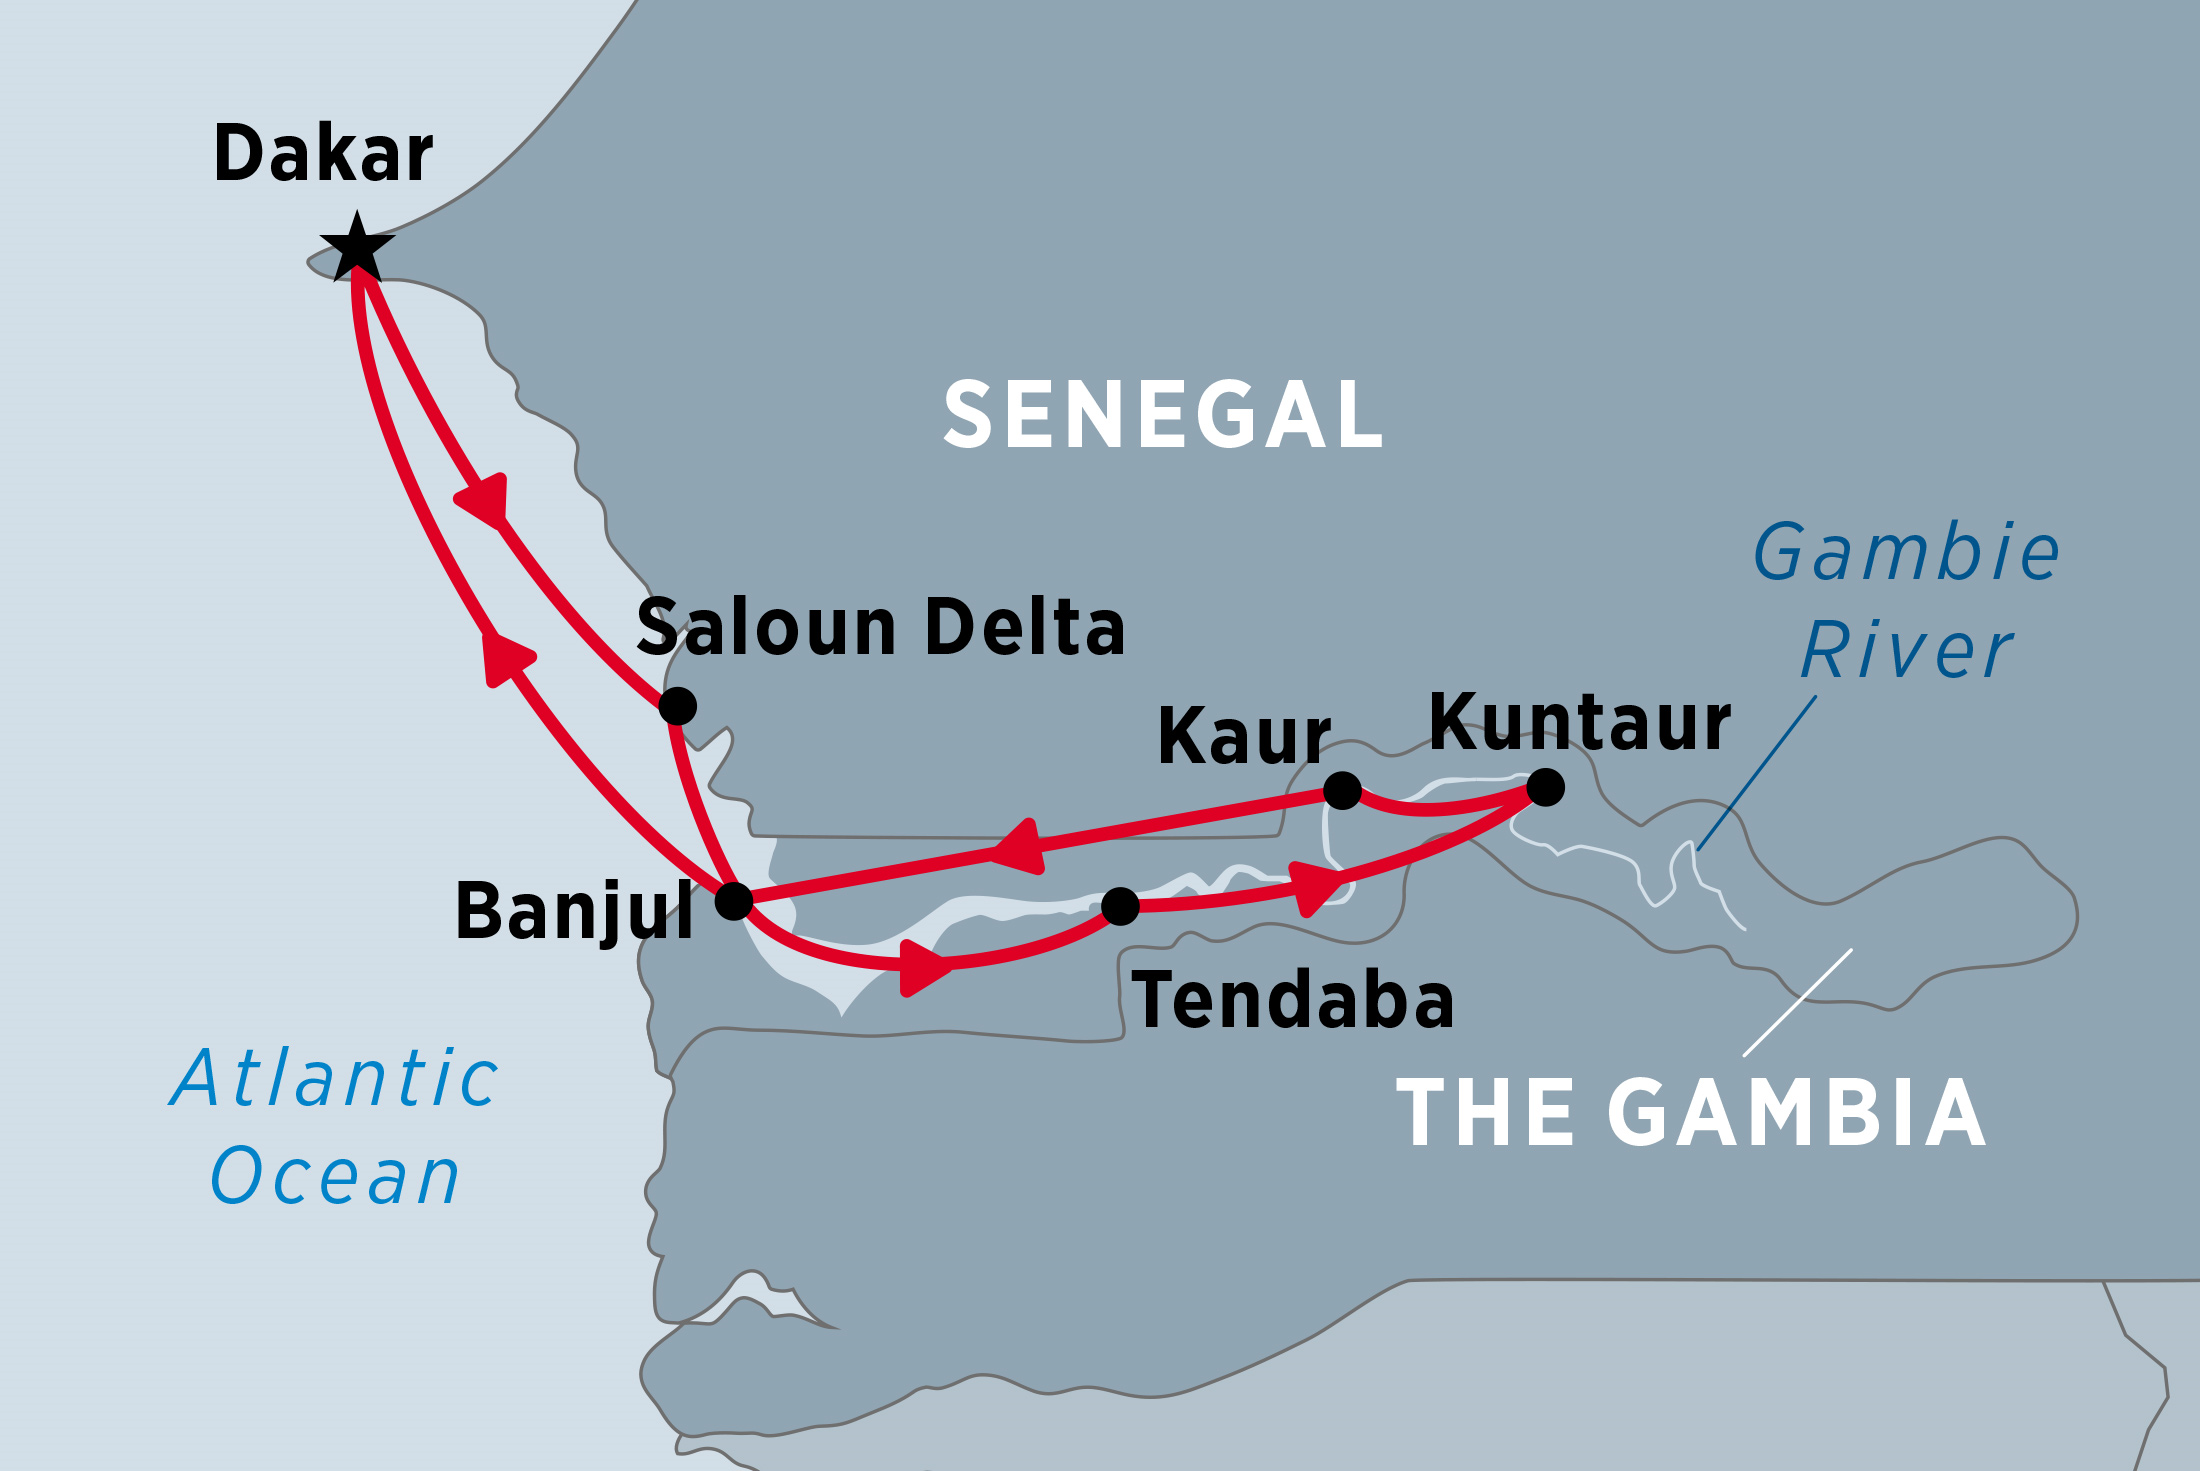 Cruising the Rivers of West Africa (Ex Dakar) | Peregrine Adventures on